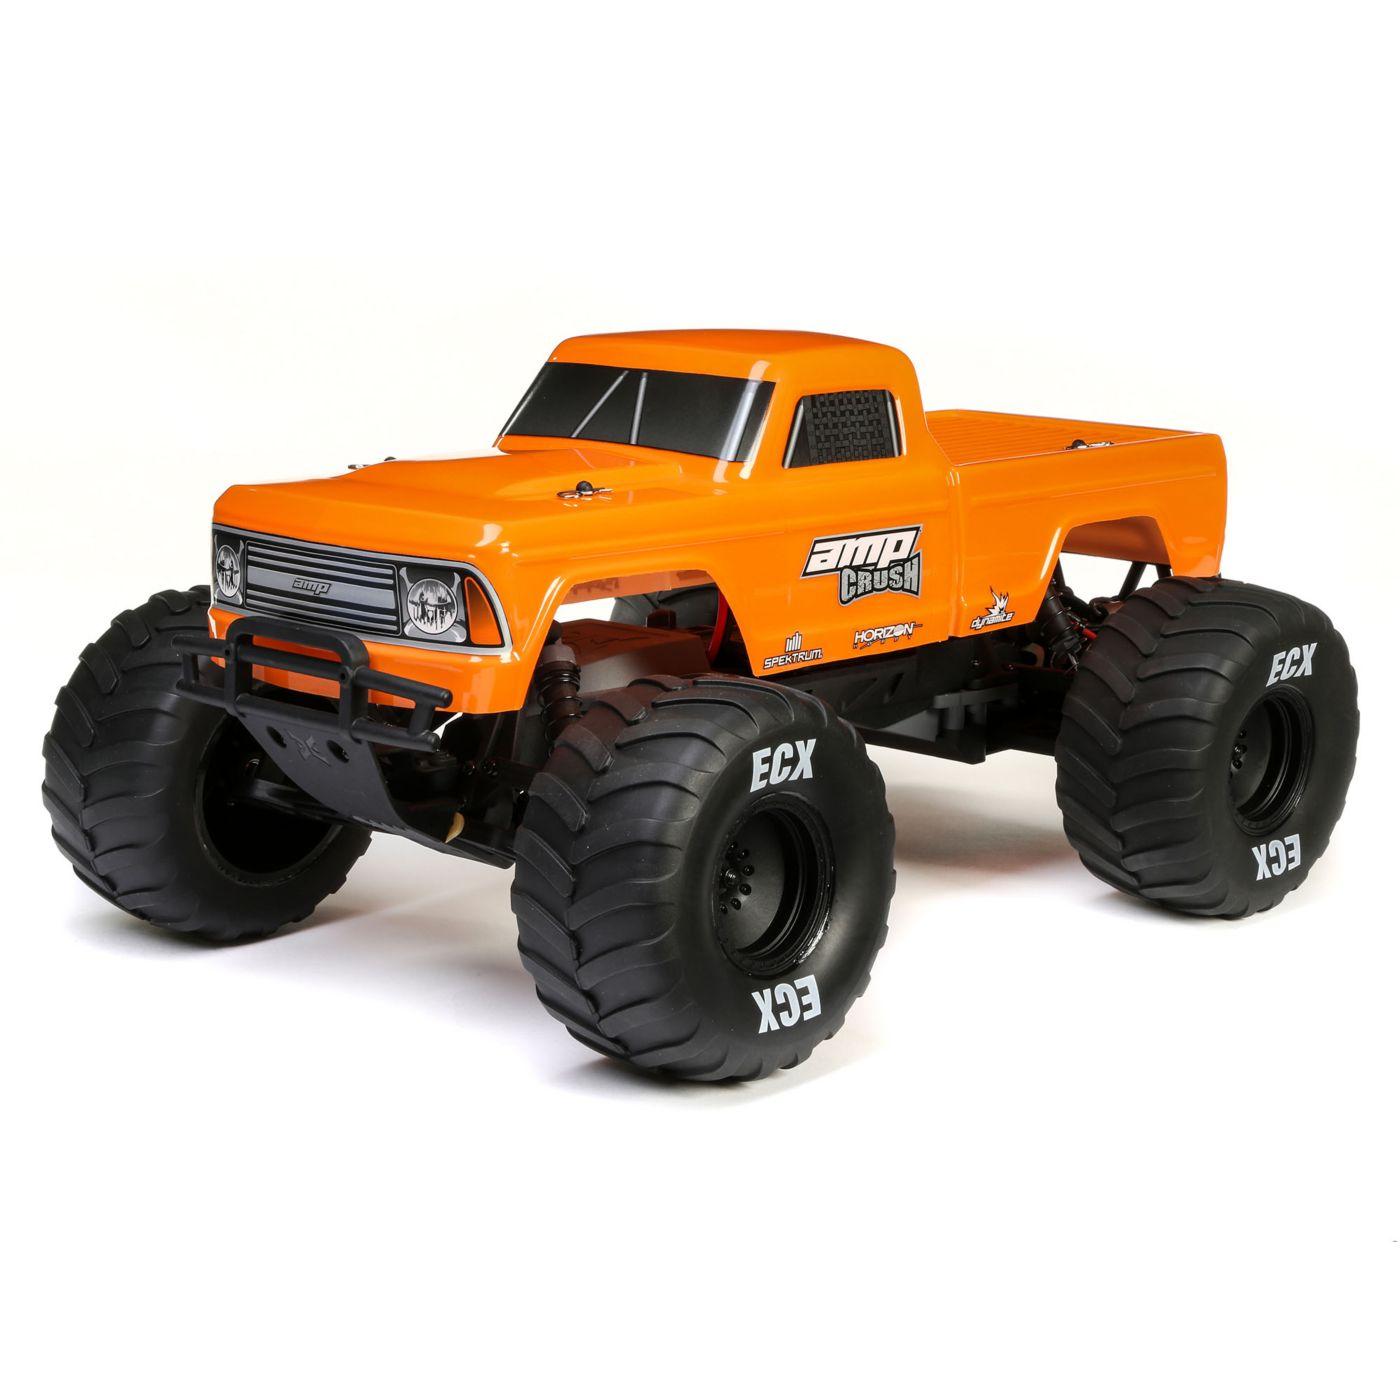 ECX Amp Crush 2WD Monster Truck - Orange